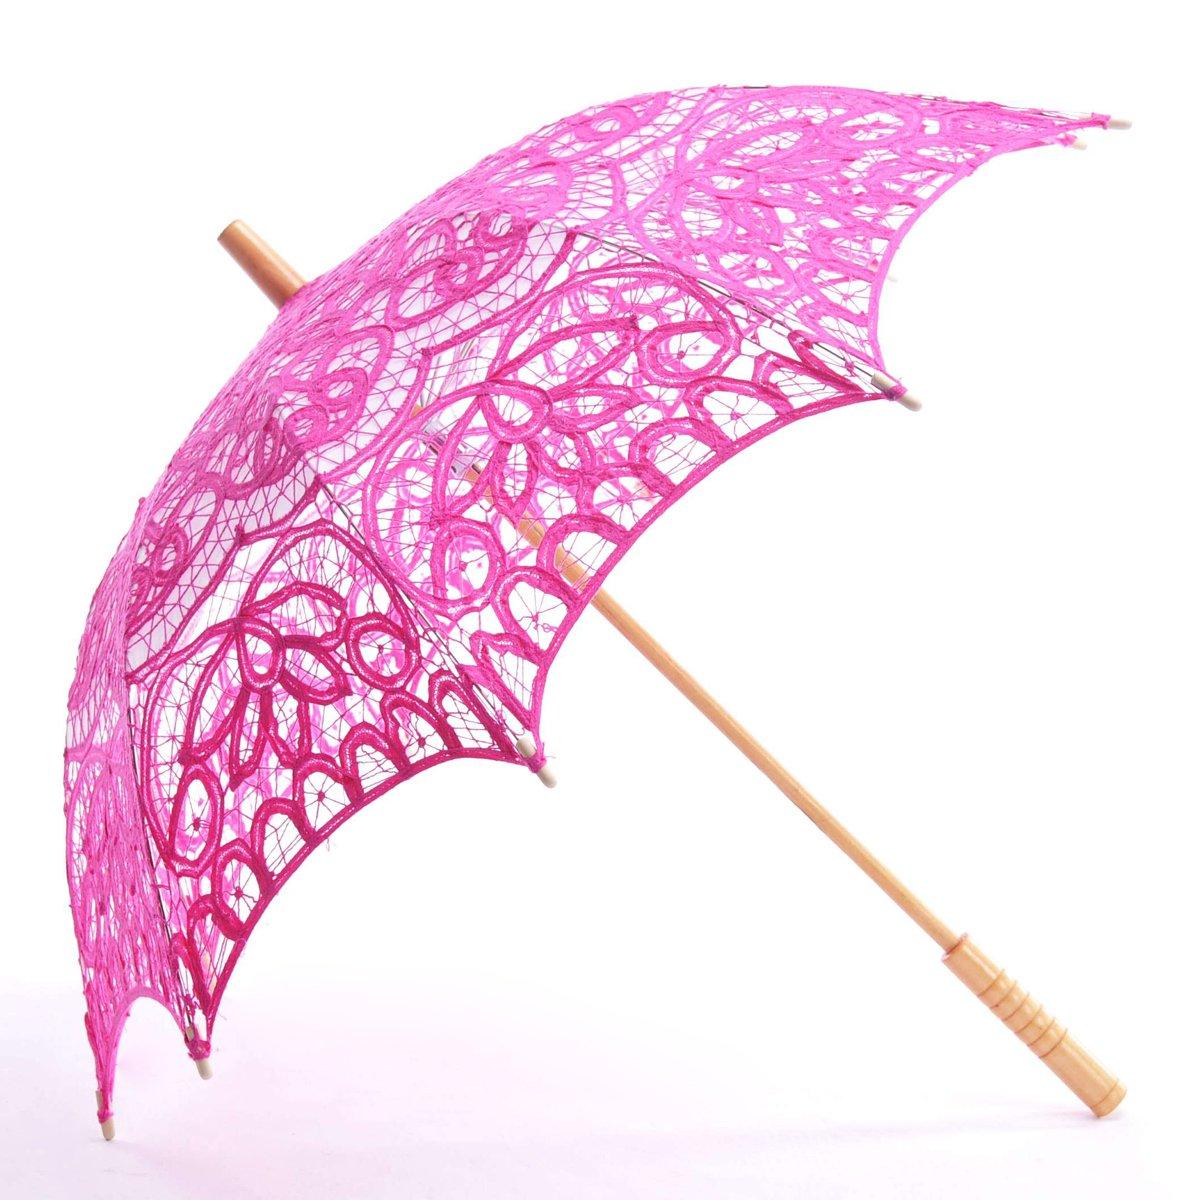 Topwedding Classic Cotton Lace Parasol Umbrella Bridal Shower Decoration, Fuschia by Topwedding (Image #1)